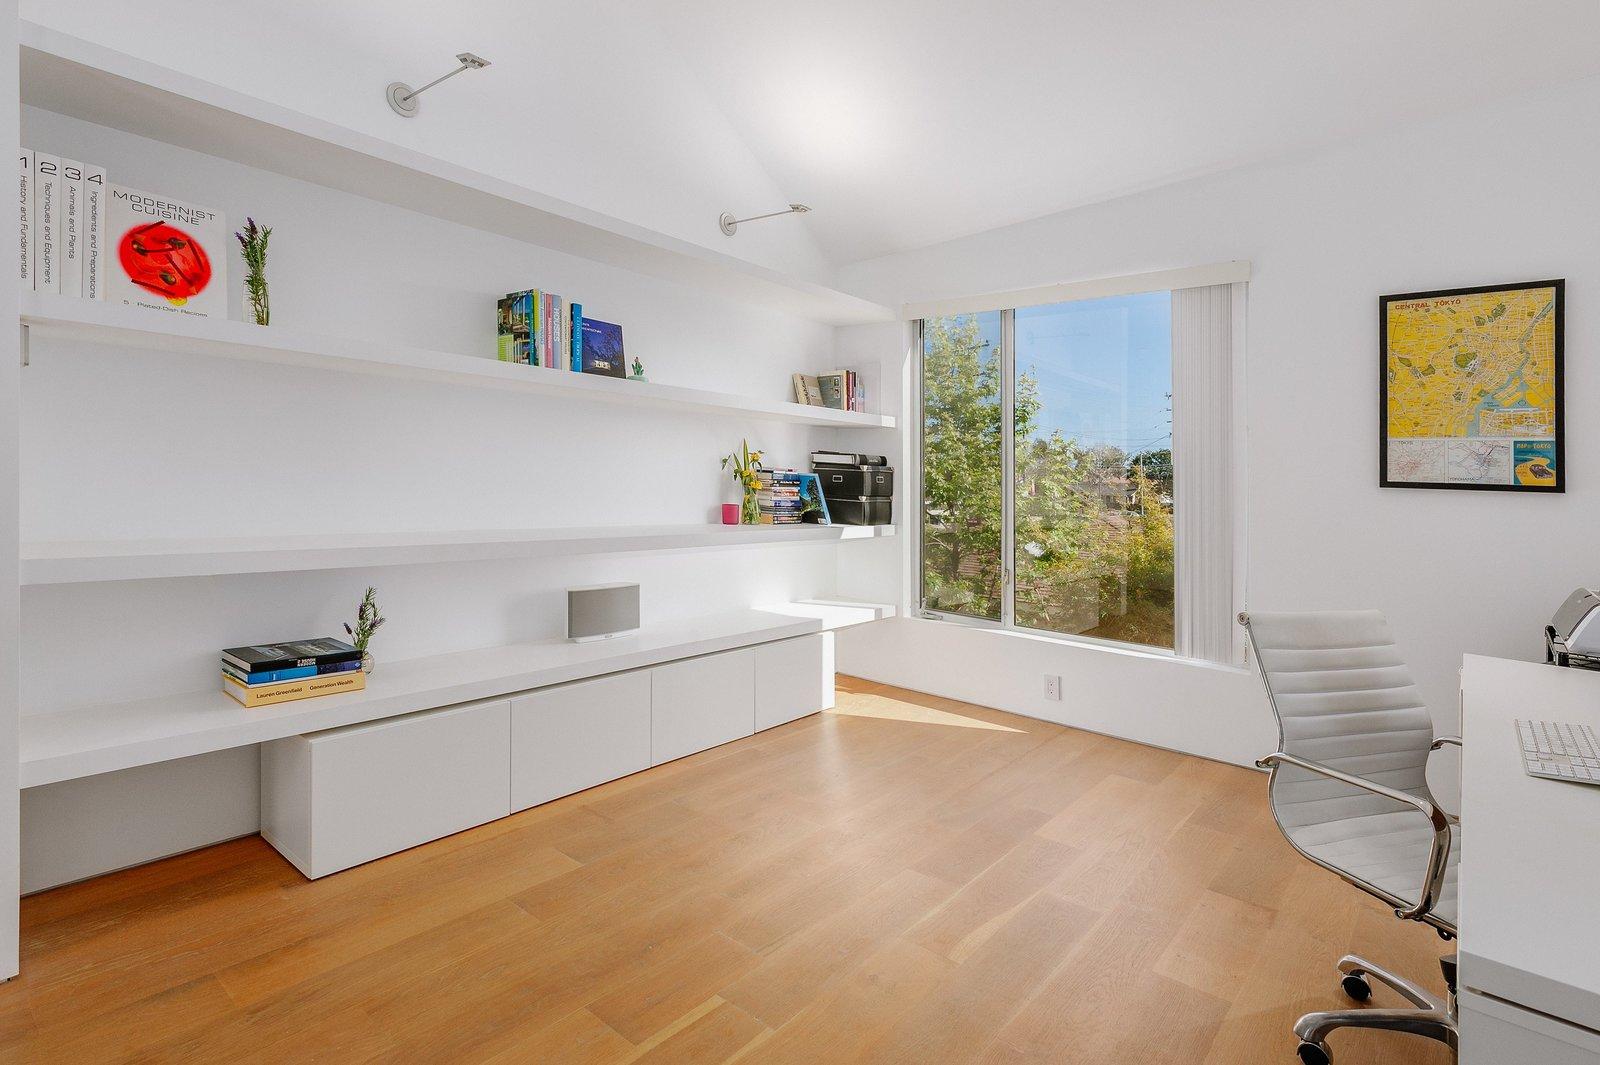 Monokuro House office